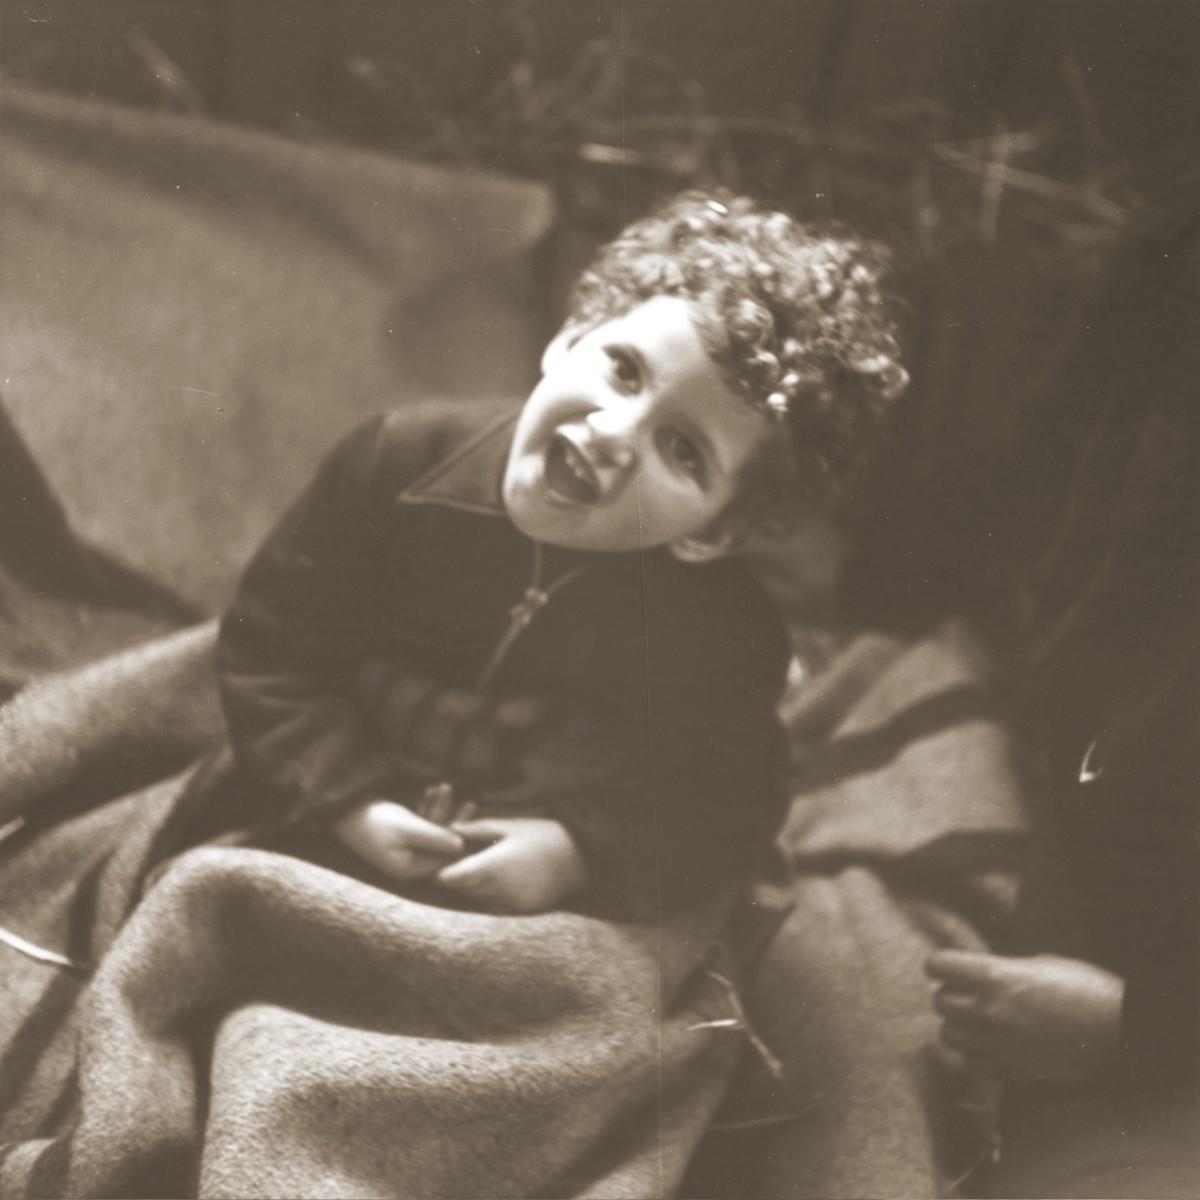 Portrait of a Jewish child in the Hadwigschulhaus in St, Gallen.